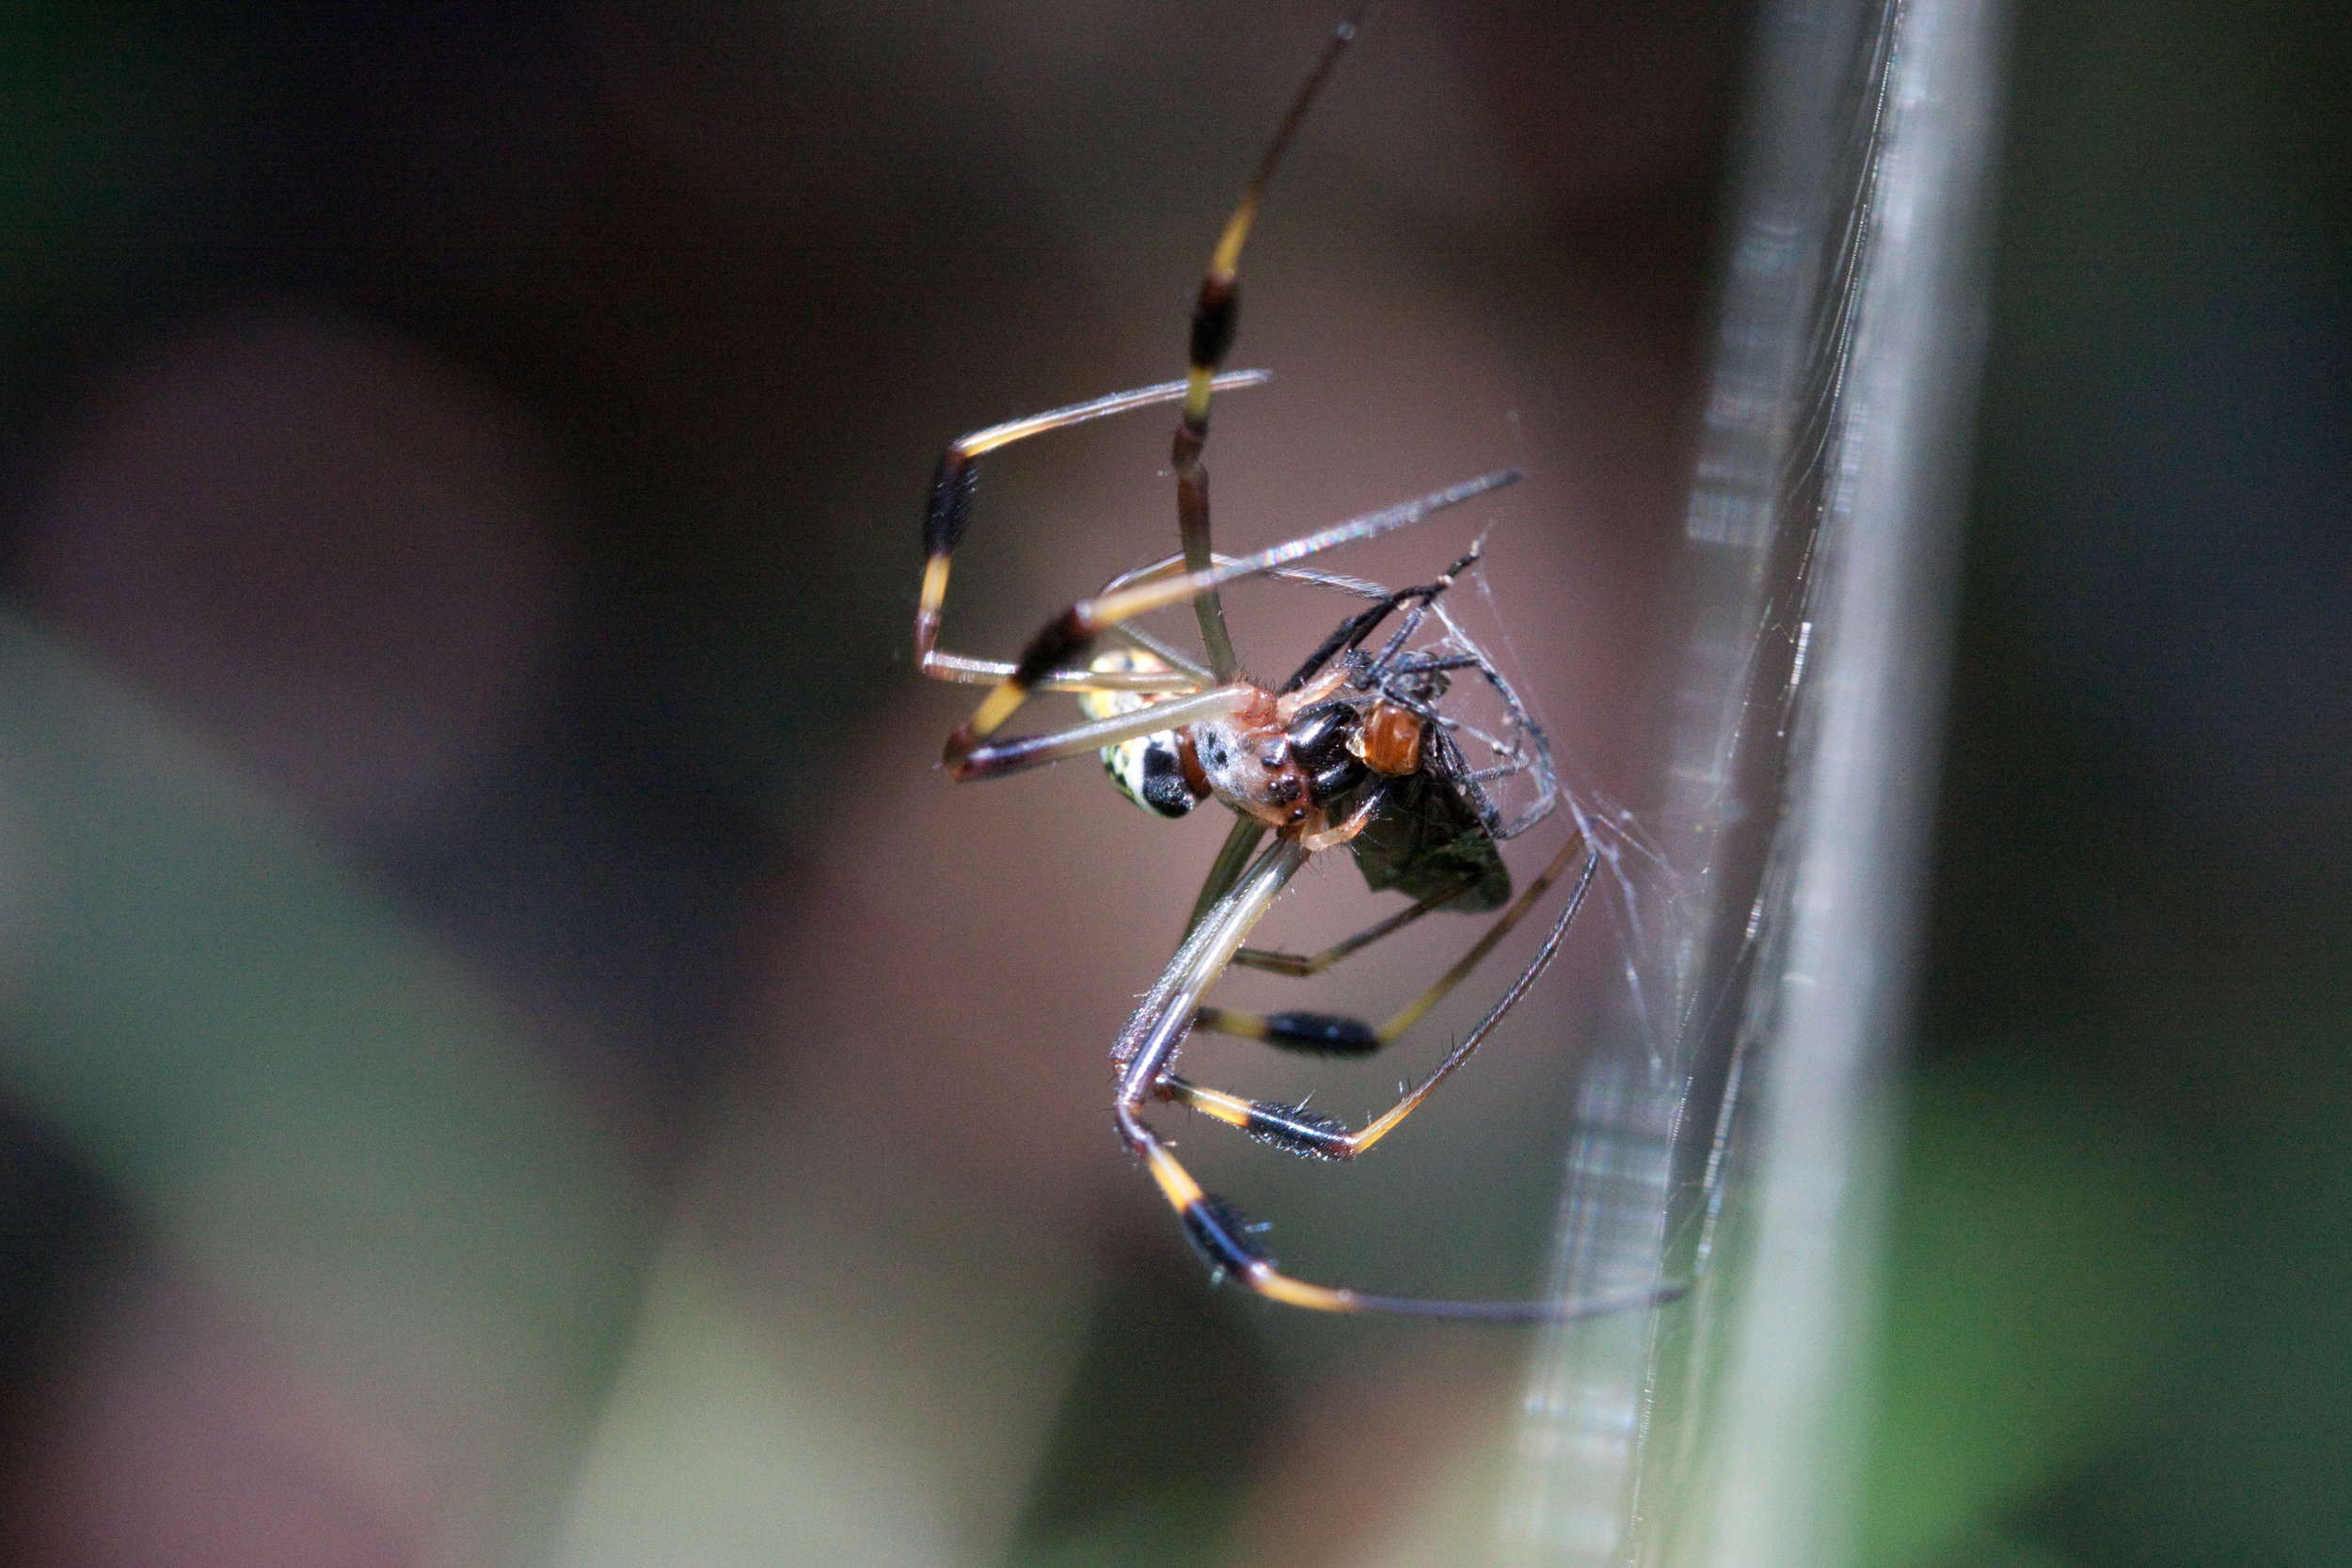 Feeding Spider.jpg